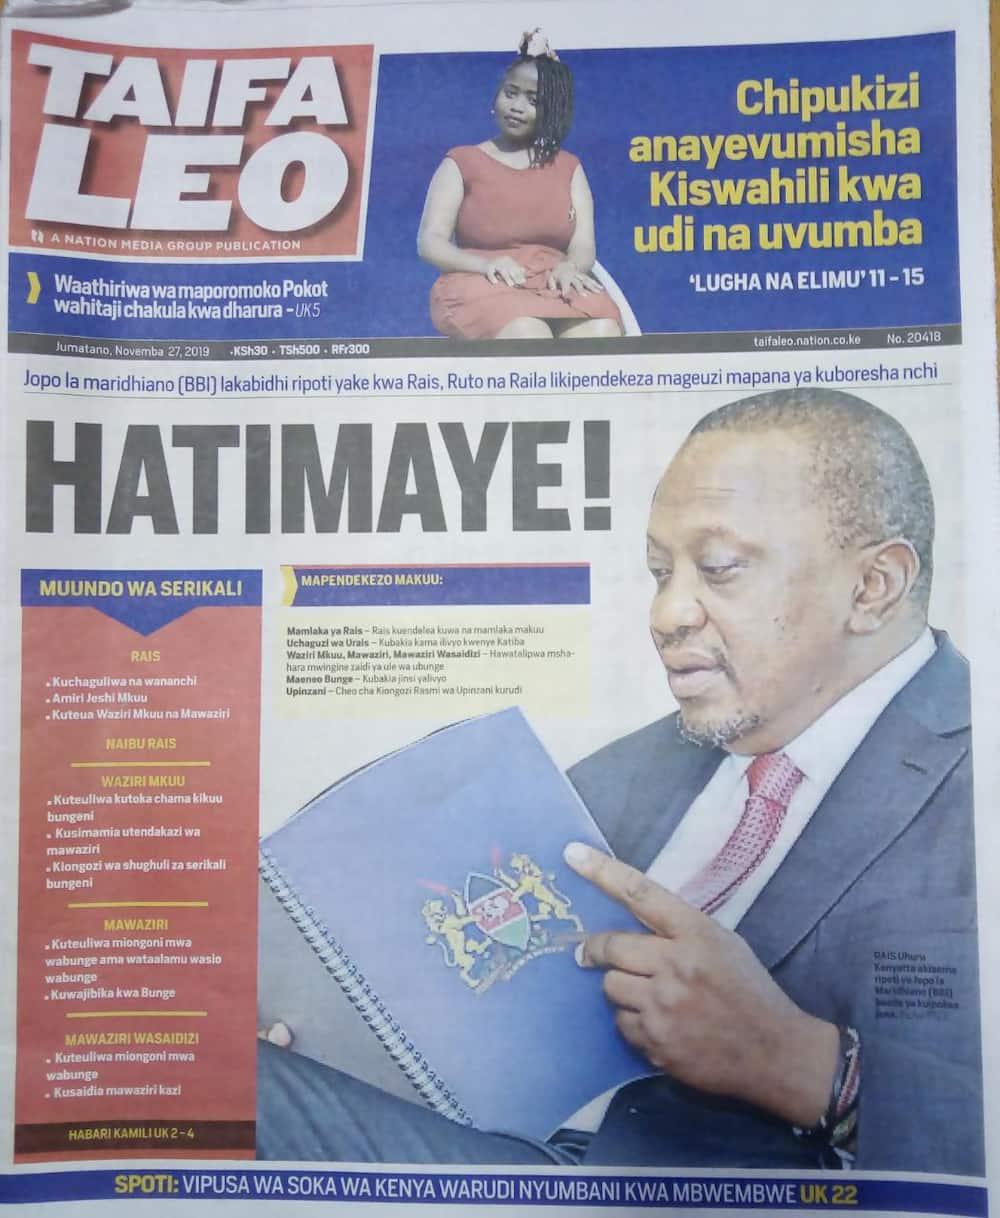 Kenyan newspapers review: BBI wants IEBC overhauled for lack of public confident